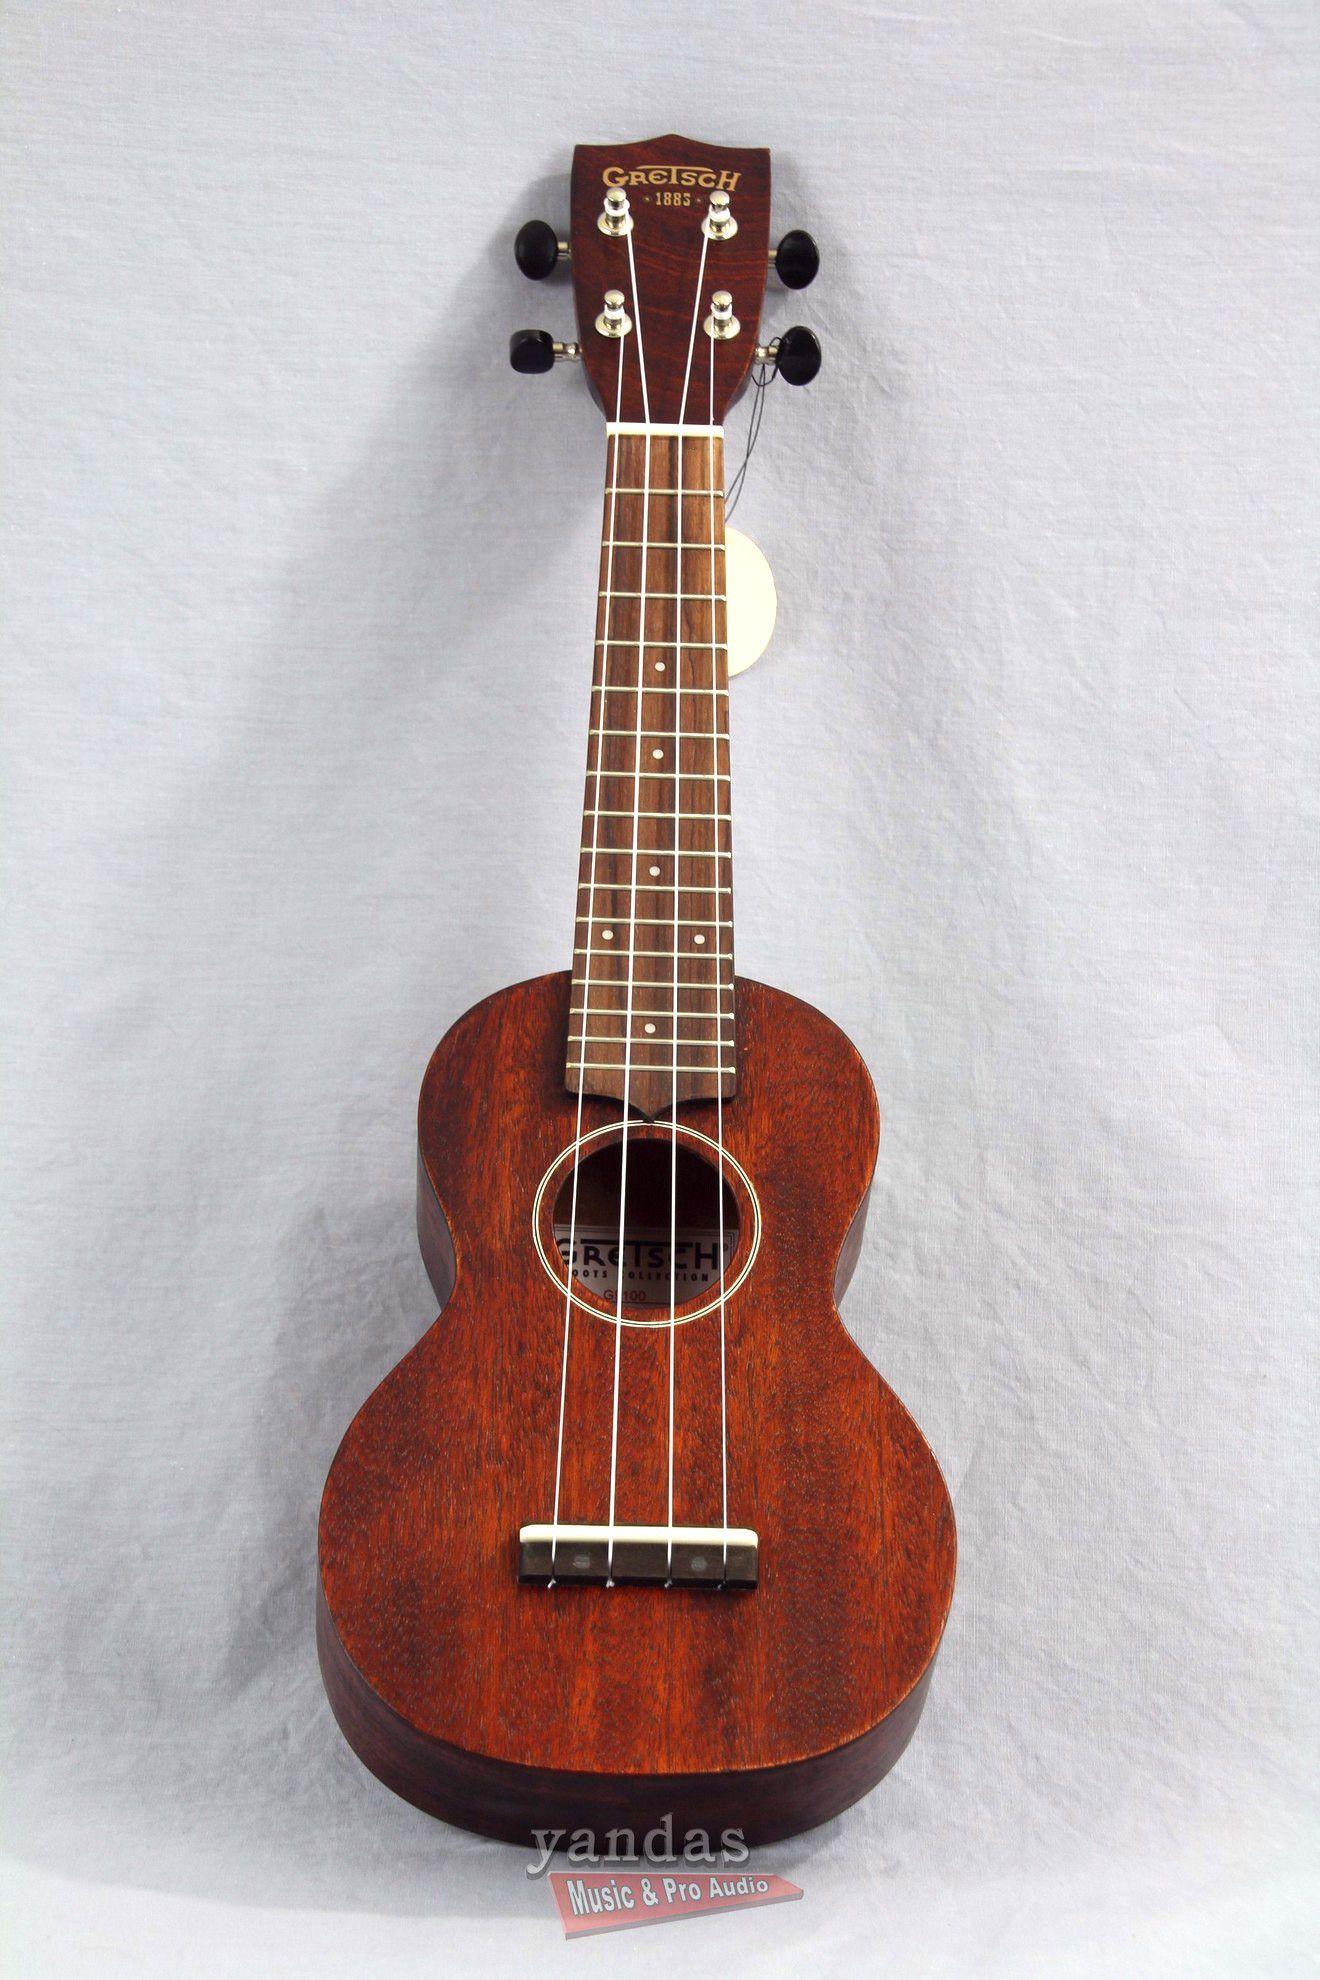 gretsch g9100 soprano standard ukulele vintage mahogany stain products ukulele gretsch. Black Bedroom Furniture Sets. Home Design Ideas